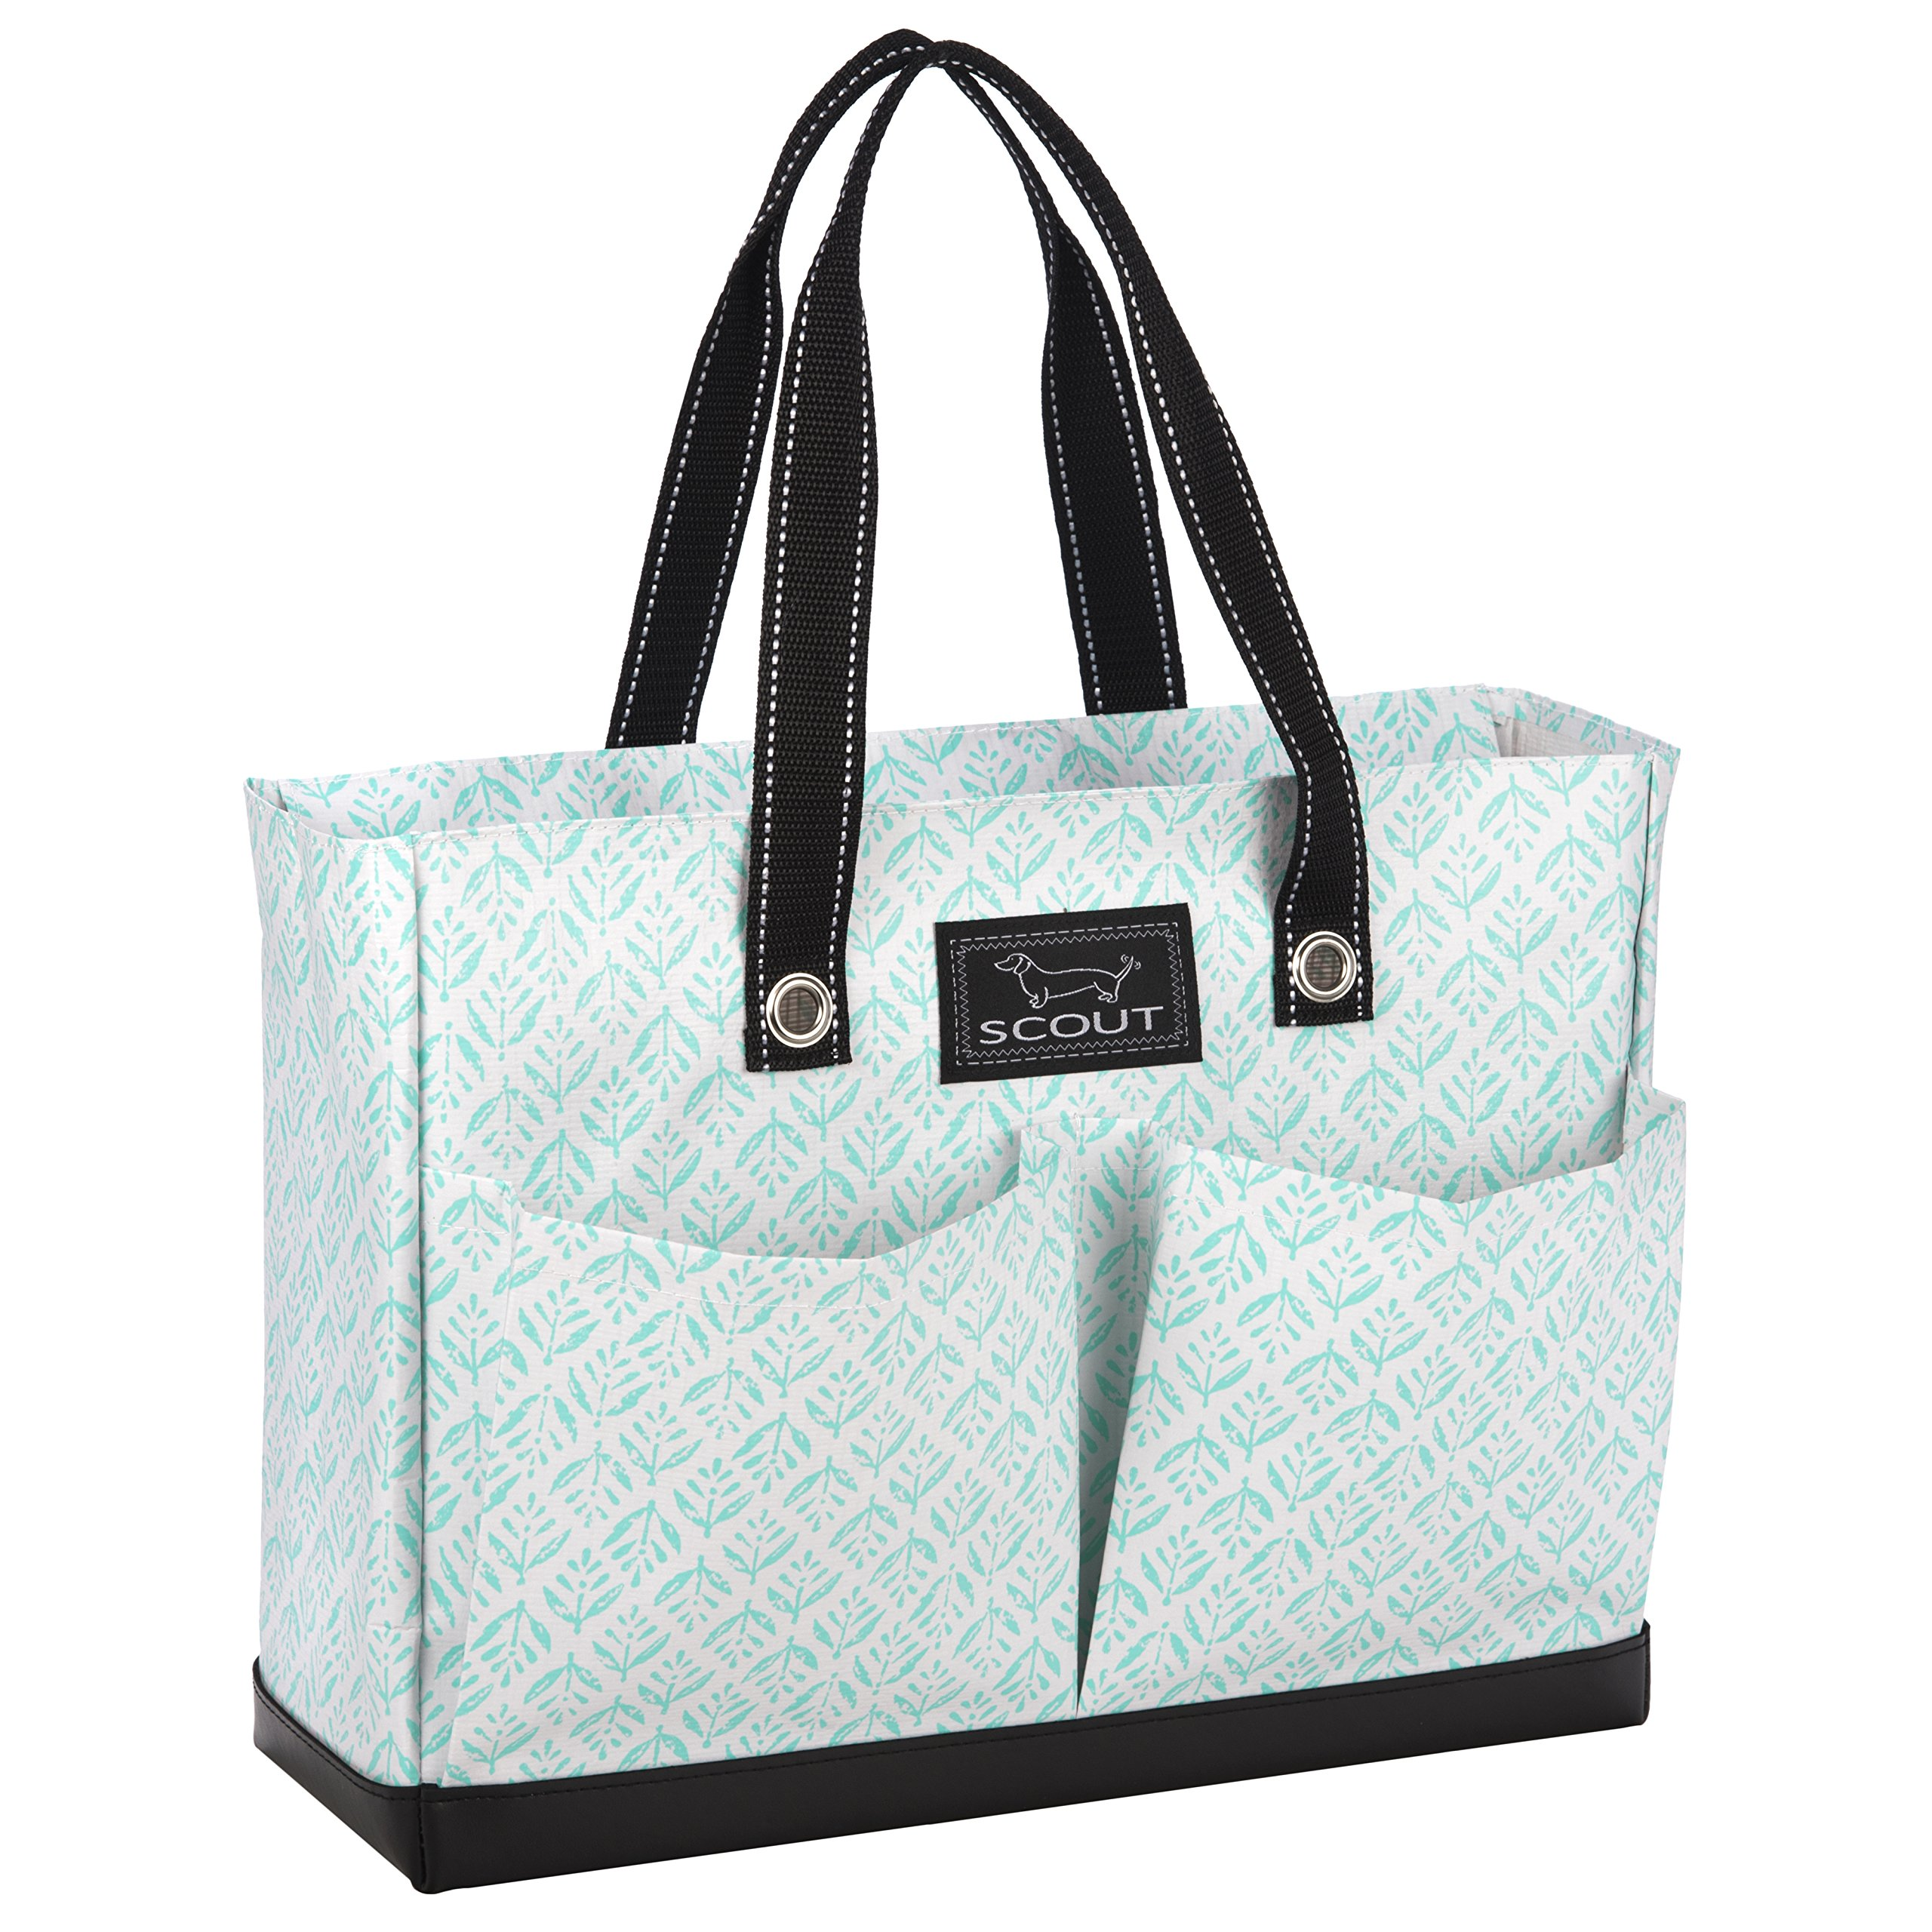 SCOUT Uptown Girl Medium Multi-Pocket Tote Bag, Water Resistant, Zips Closed, Aqua Fresca